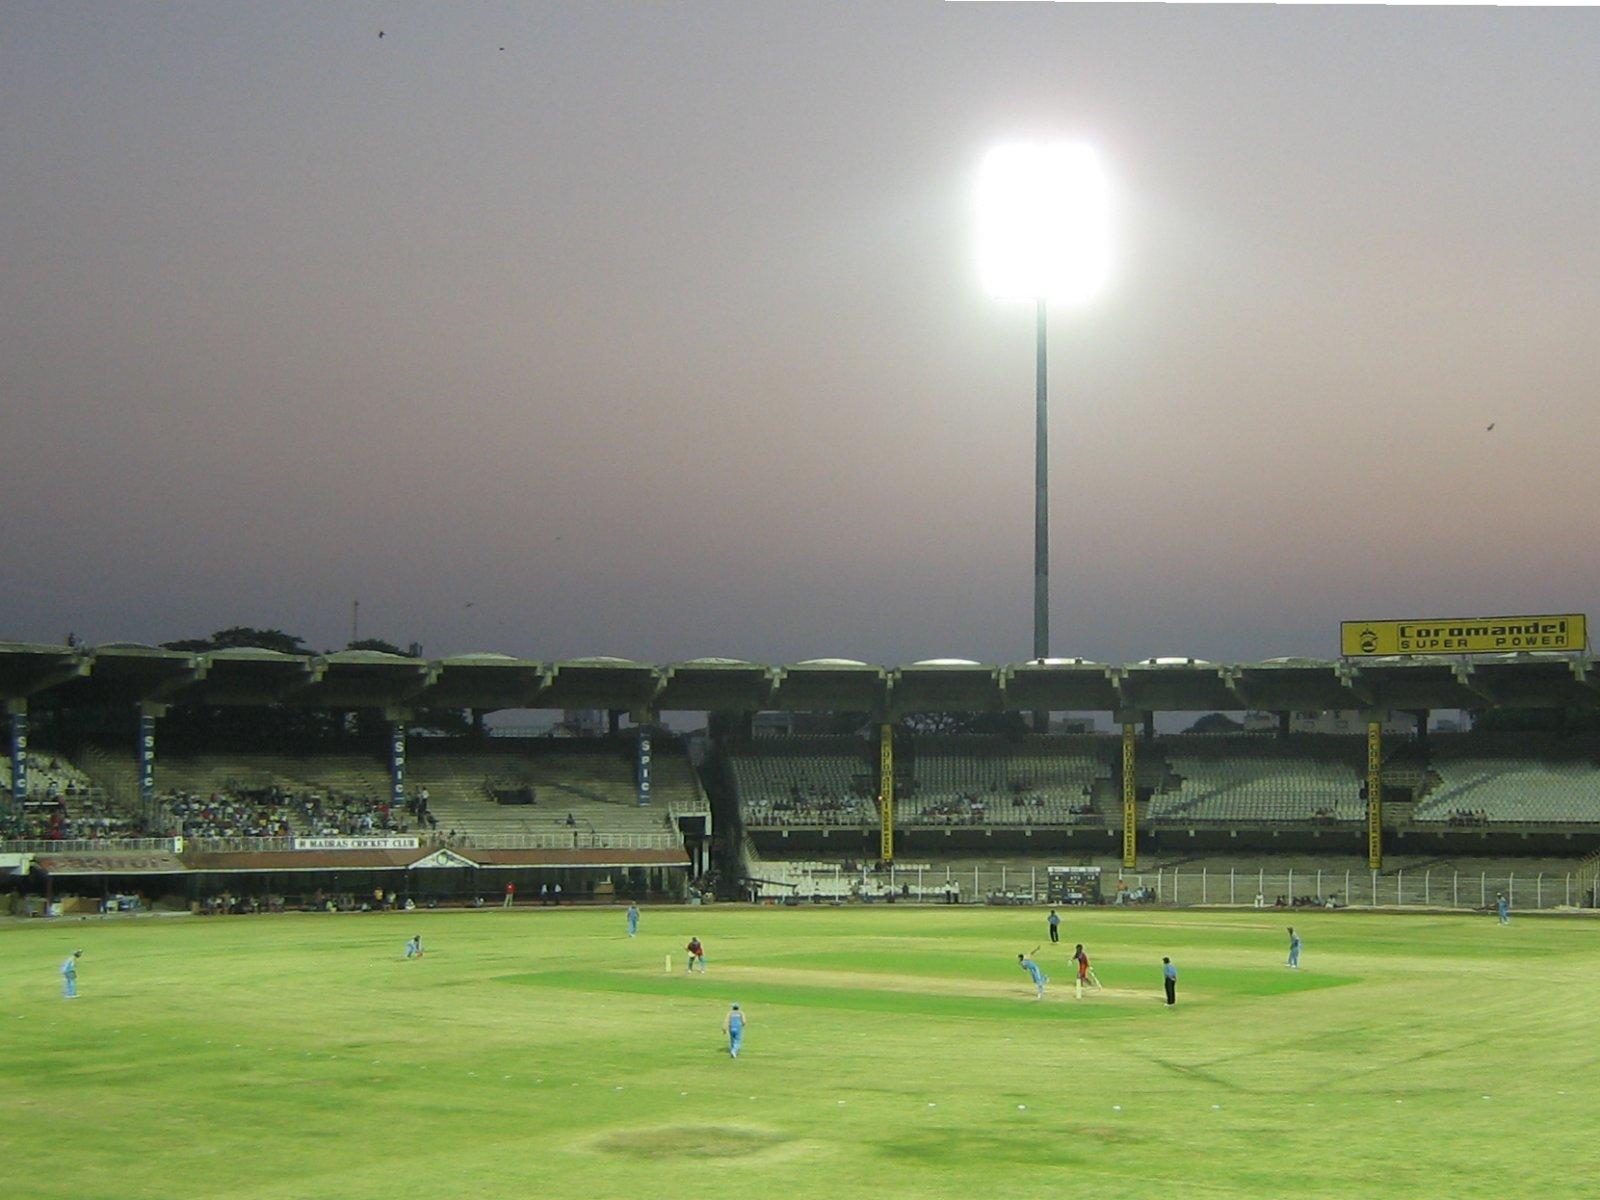 http://3.bp.blogspot.com/-dwbzZ8V07wQ/TYCeAI4McHI/AAAAAAAACg0/uIXpdmLWBHA/s1600/Chidambaram_Stadium_Chennai_wallpaper.jpg